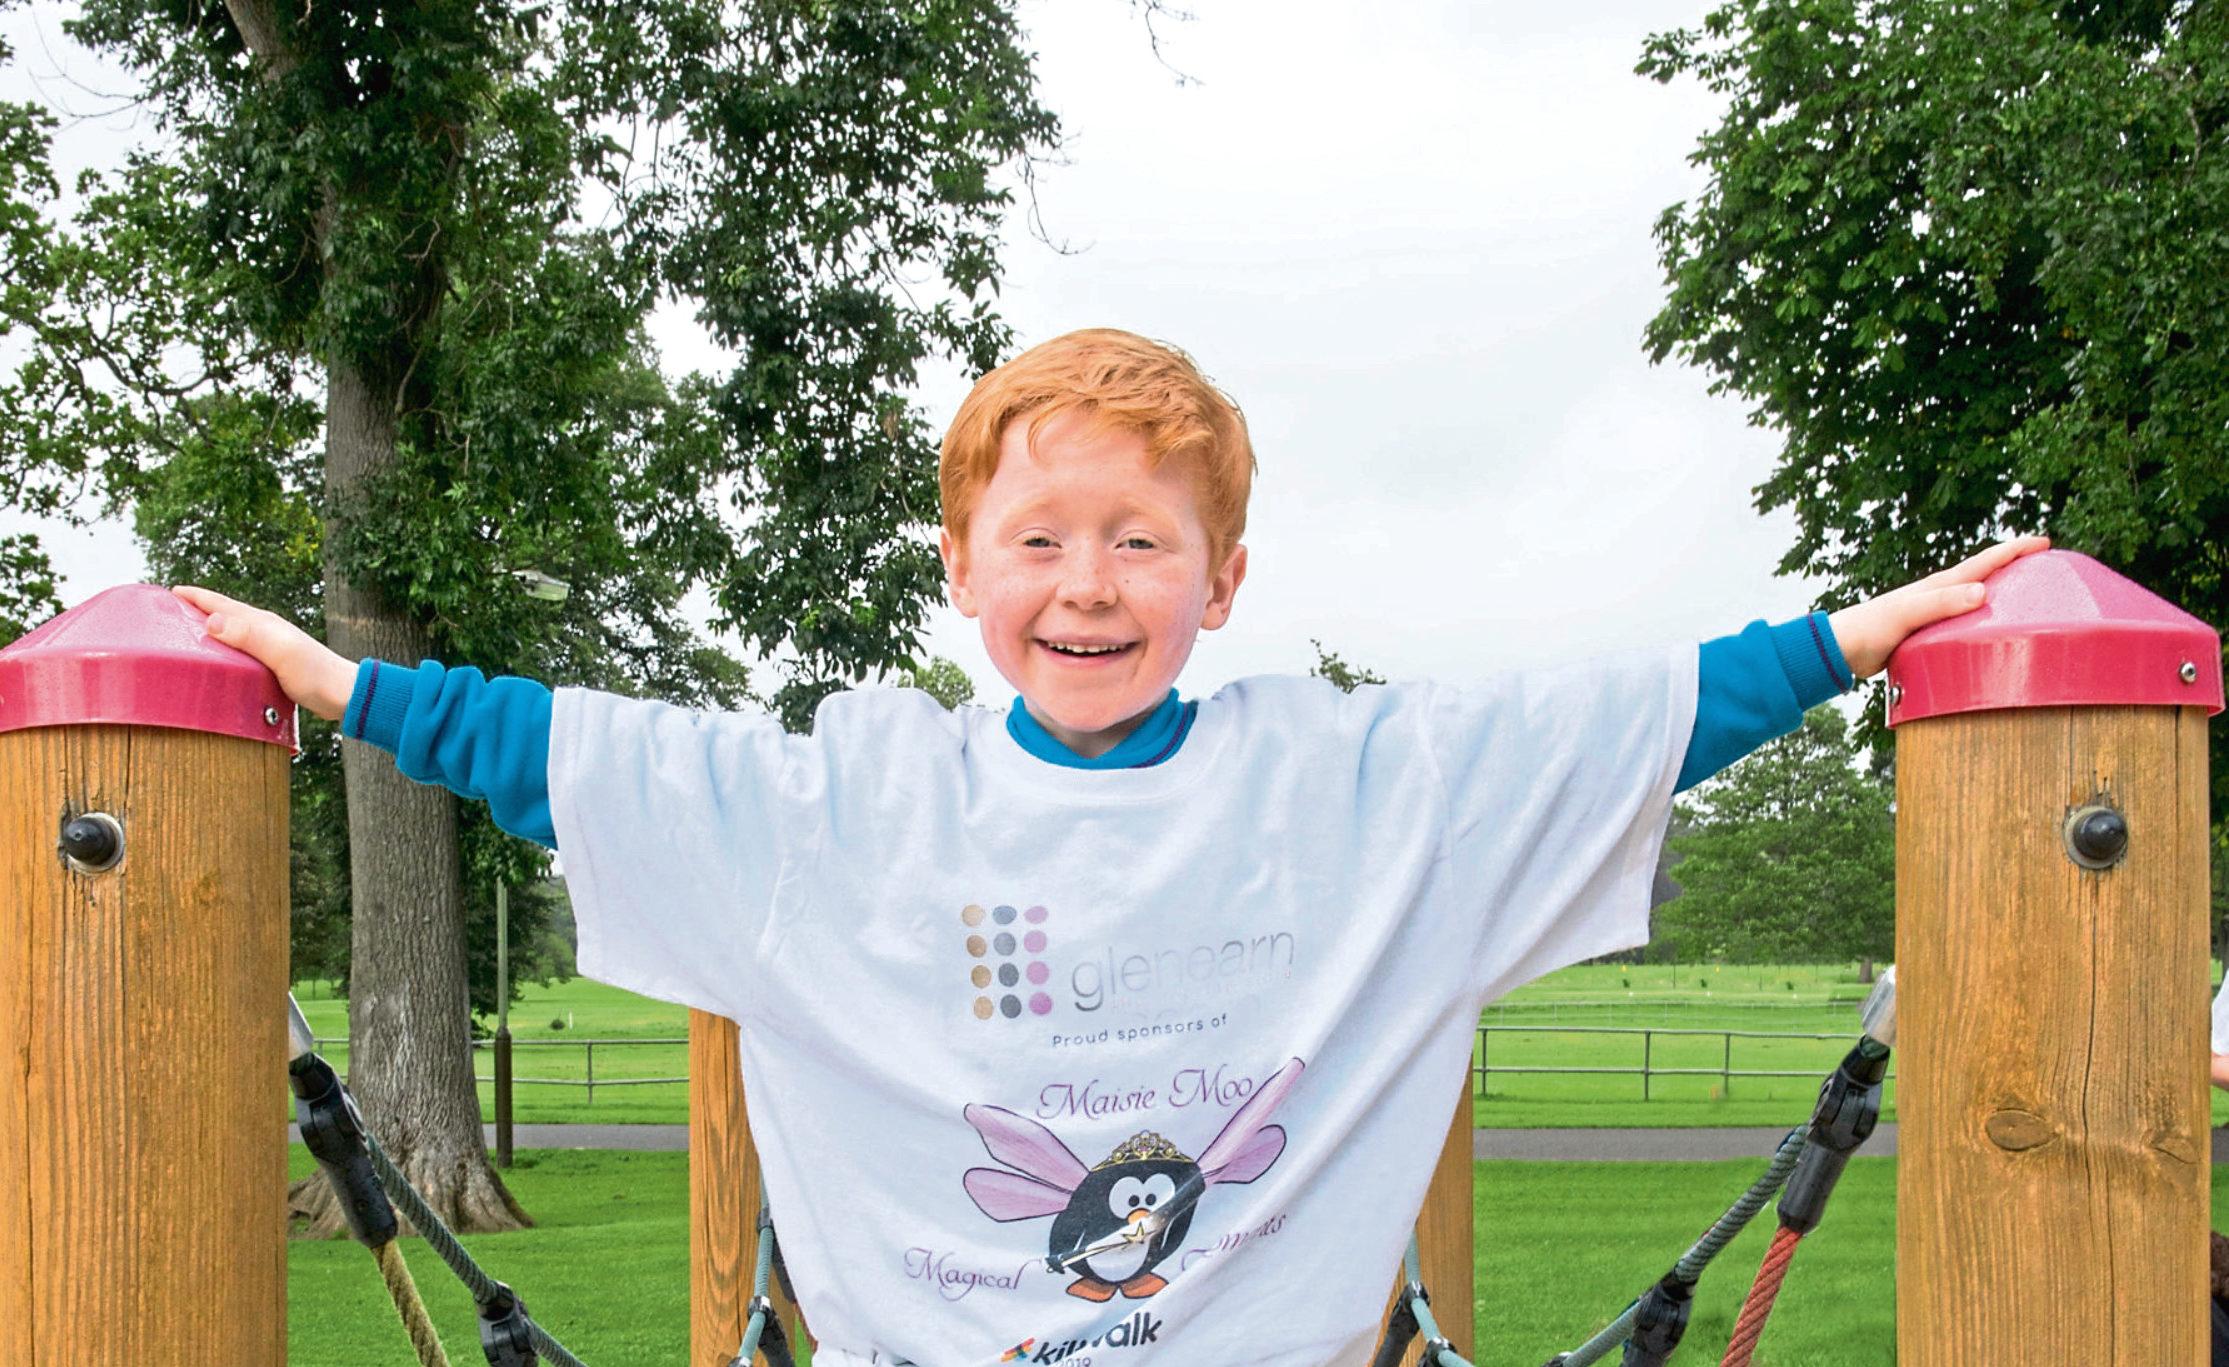 Elliott wearing his special Maisie Moo T-shirt.